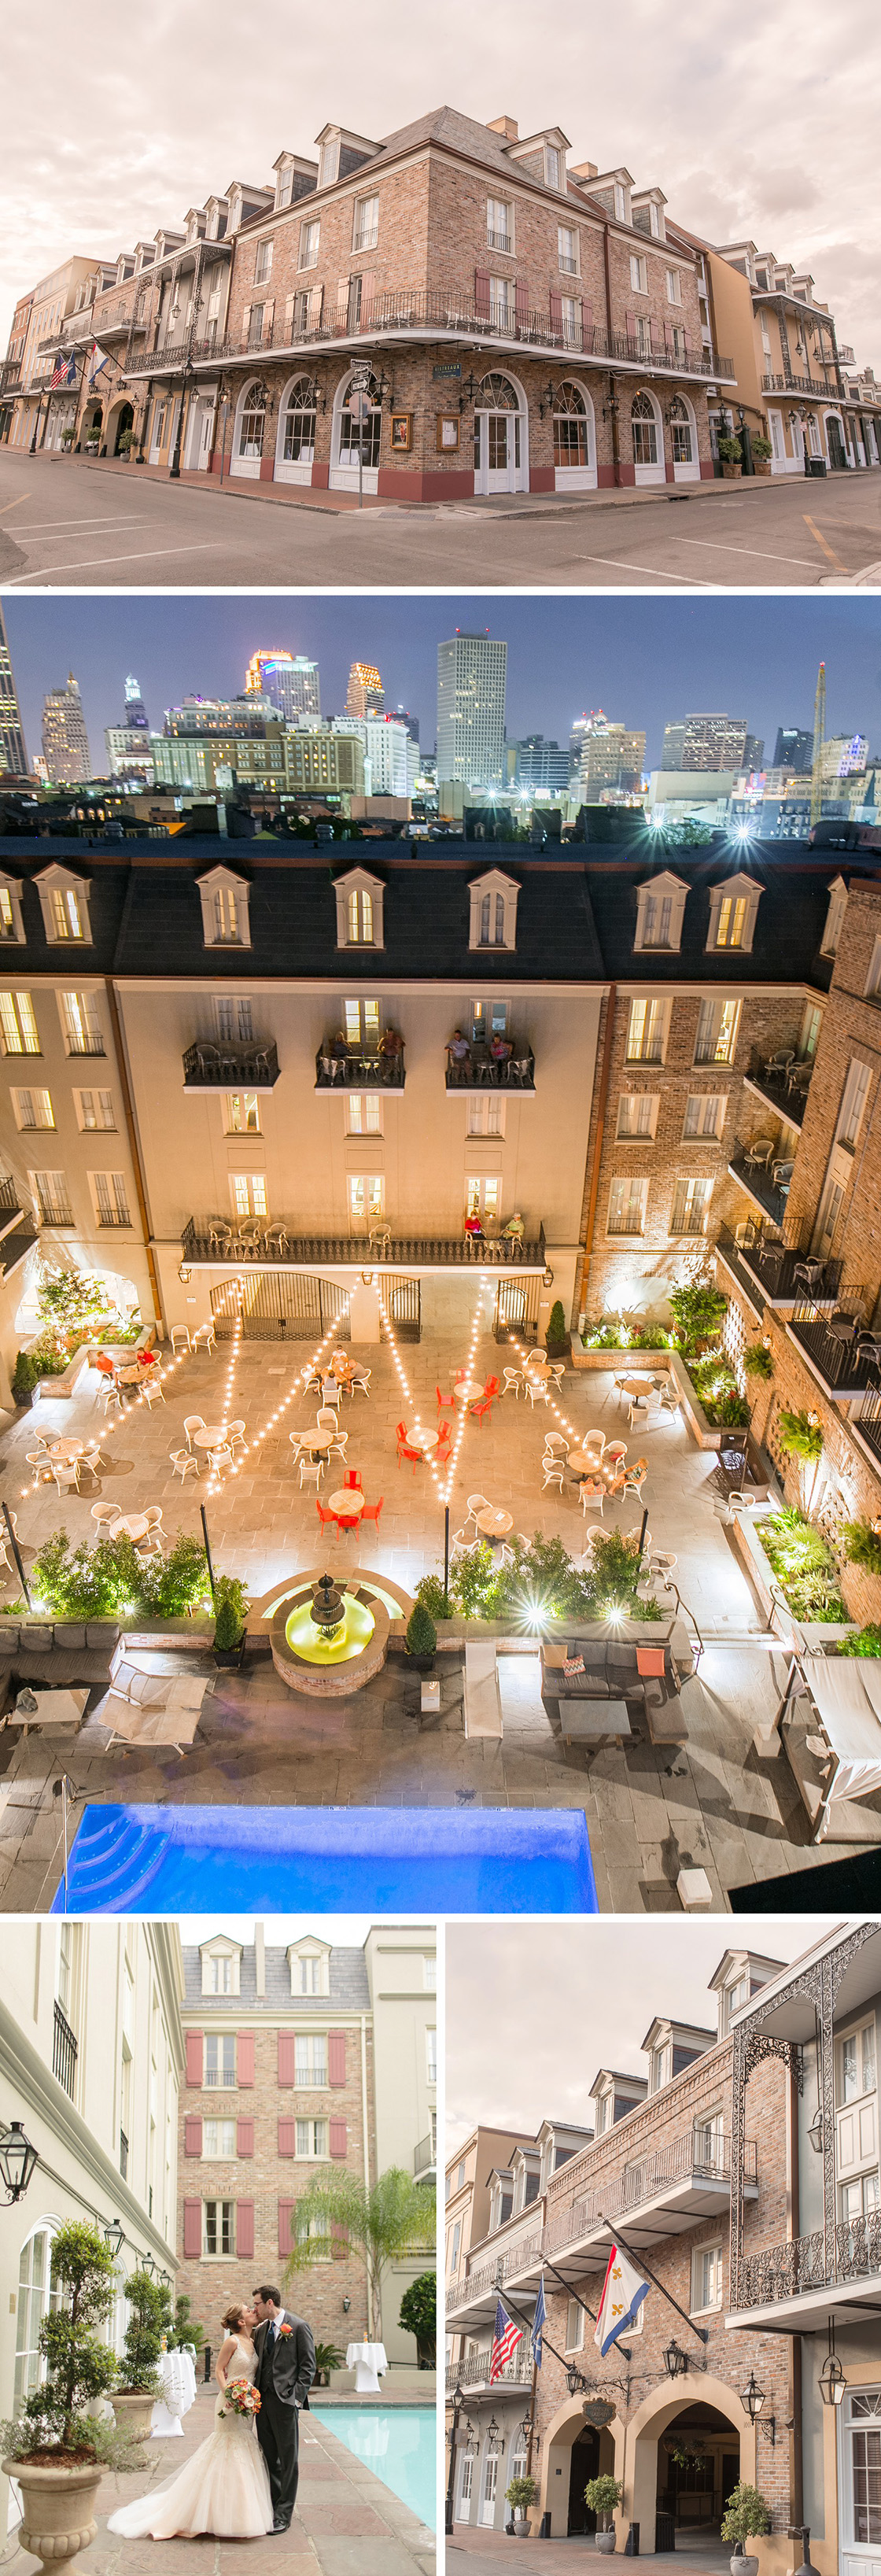 maison-dupuy-courtyard